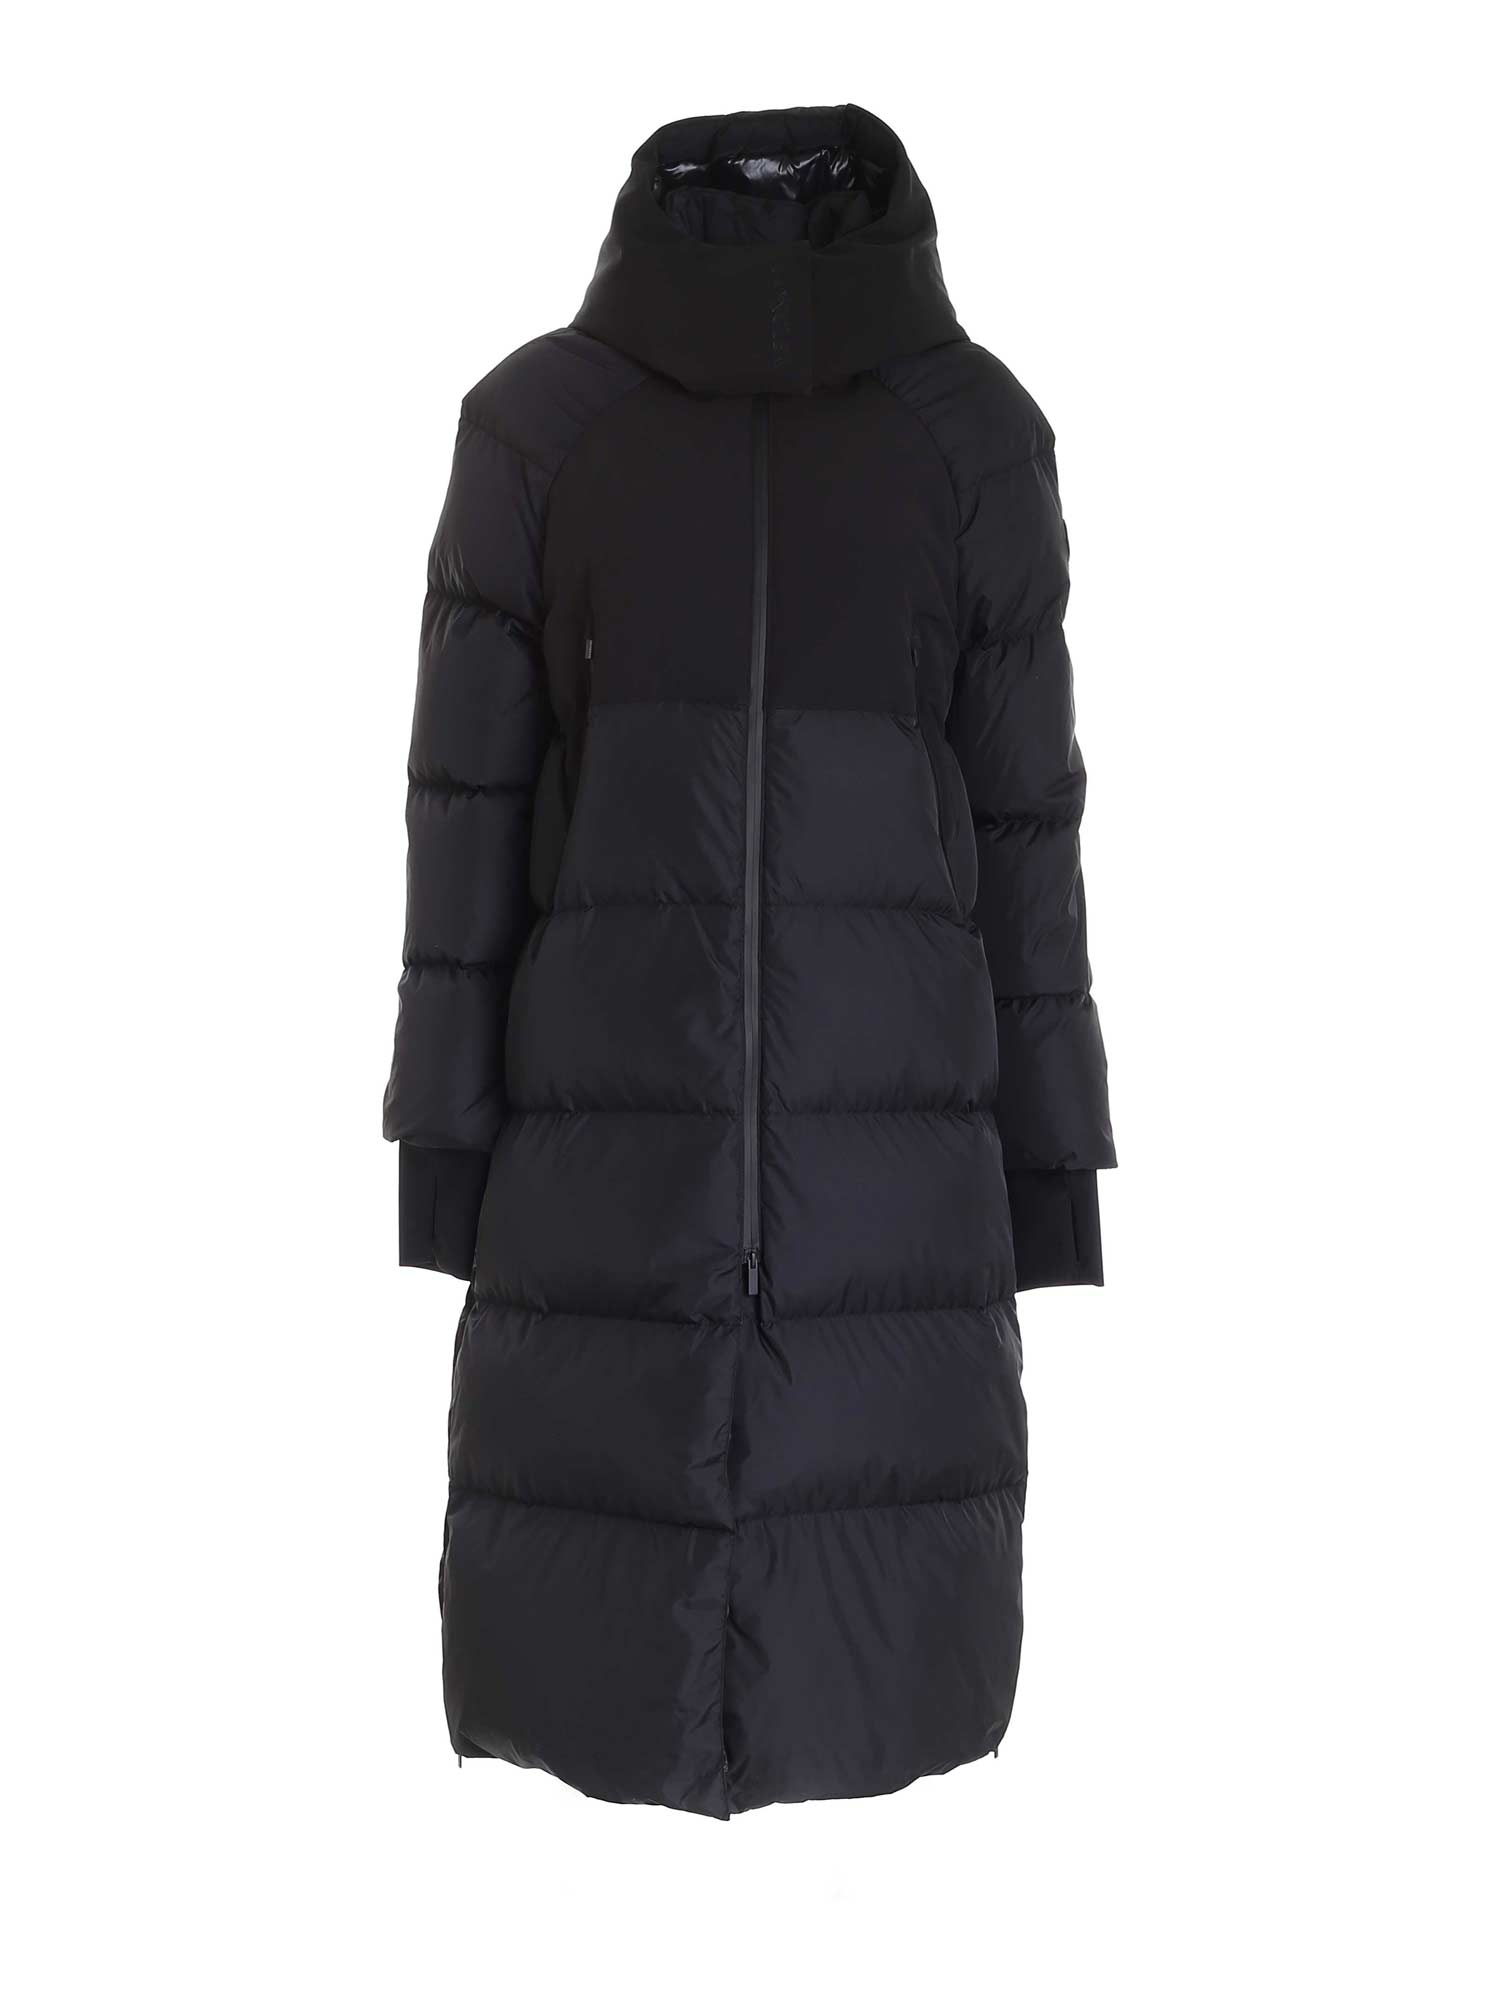 Moncler - Heliotrope Down Jacket